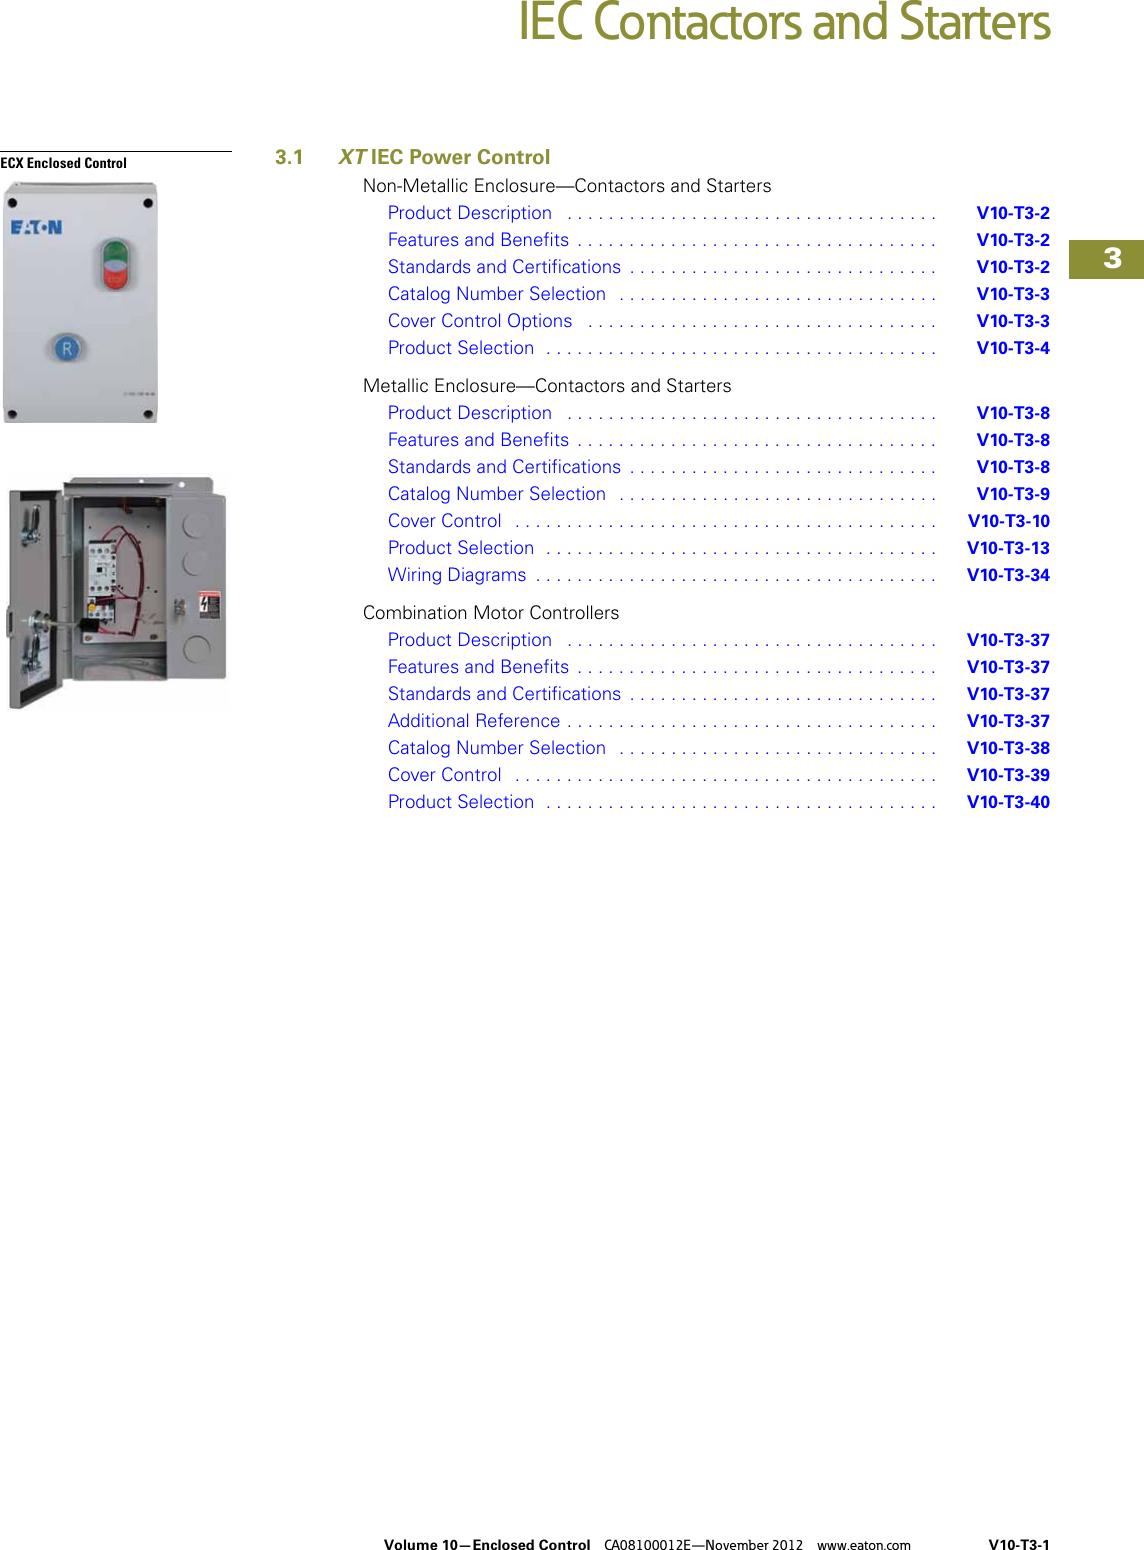 Volume 10 Tab 3 Eaton Lighting Contactor 277v Wiring Diagram